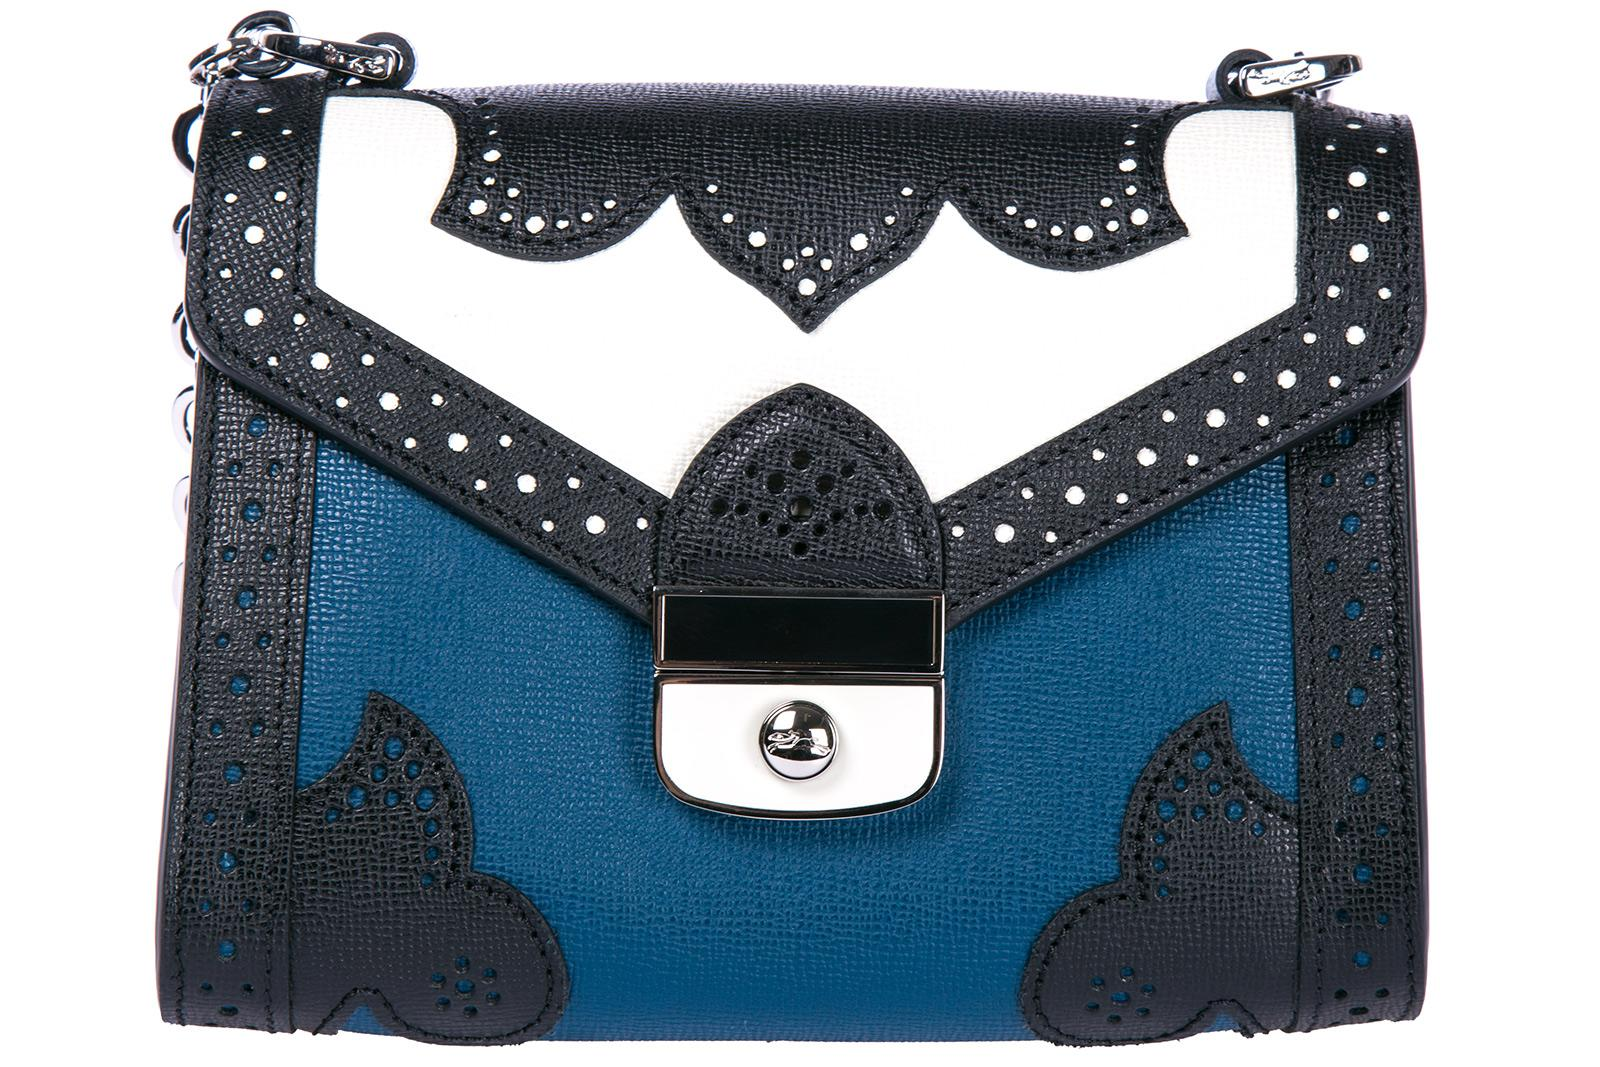 Longchamp Women's Leather Cross-body Messenger Shoulder Bag In Blue